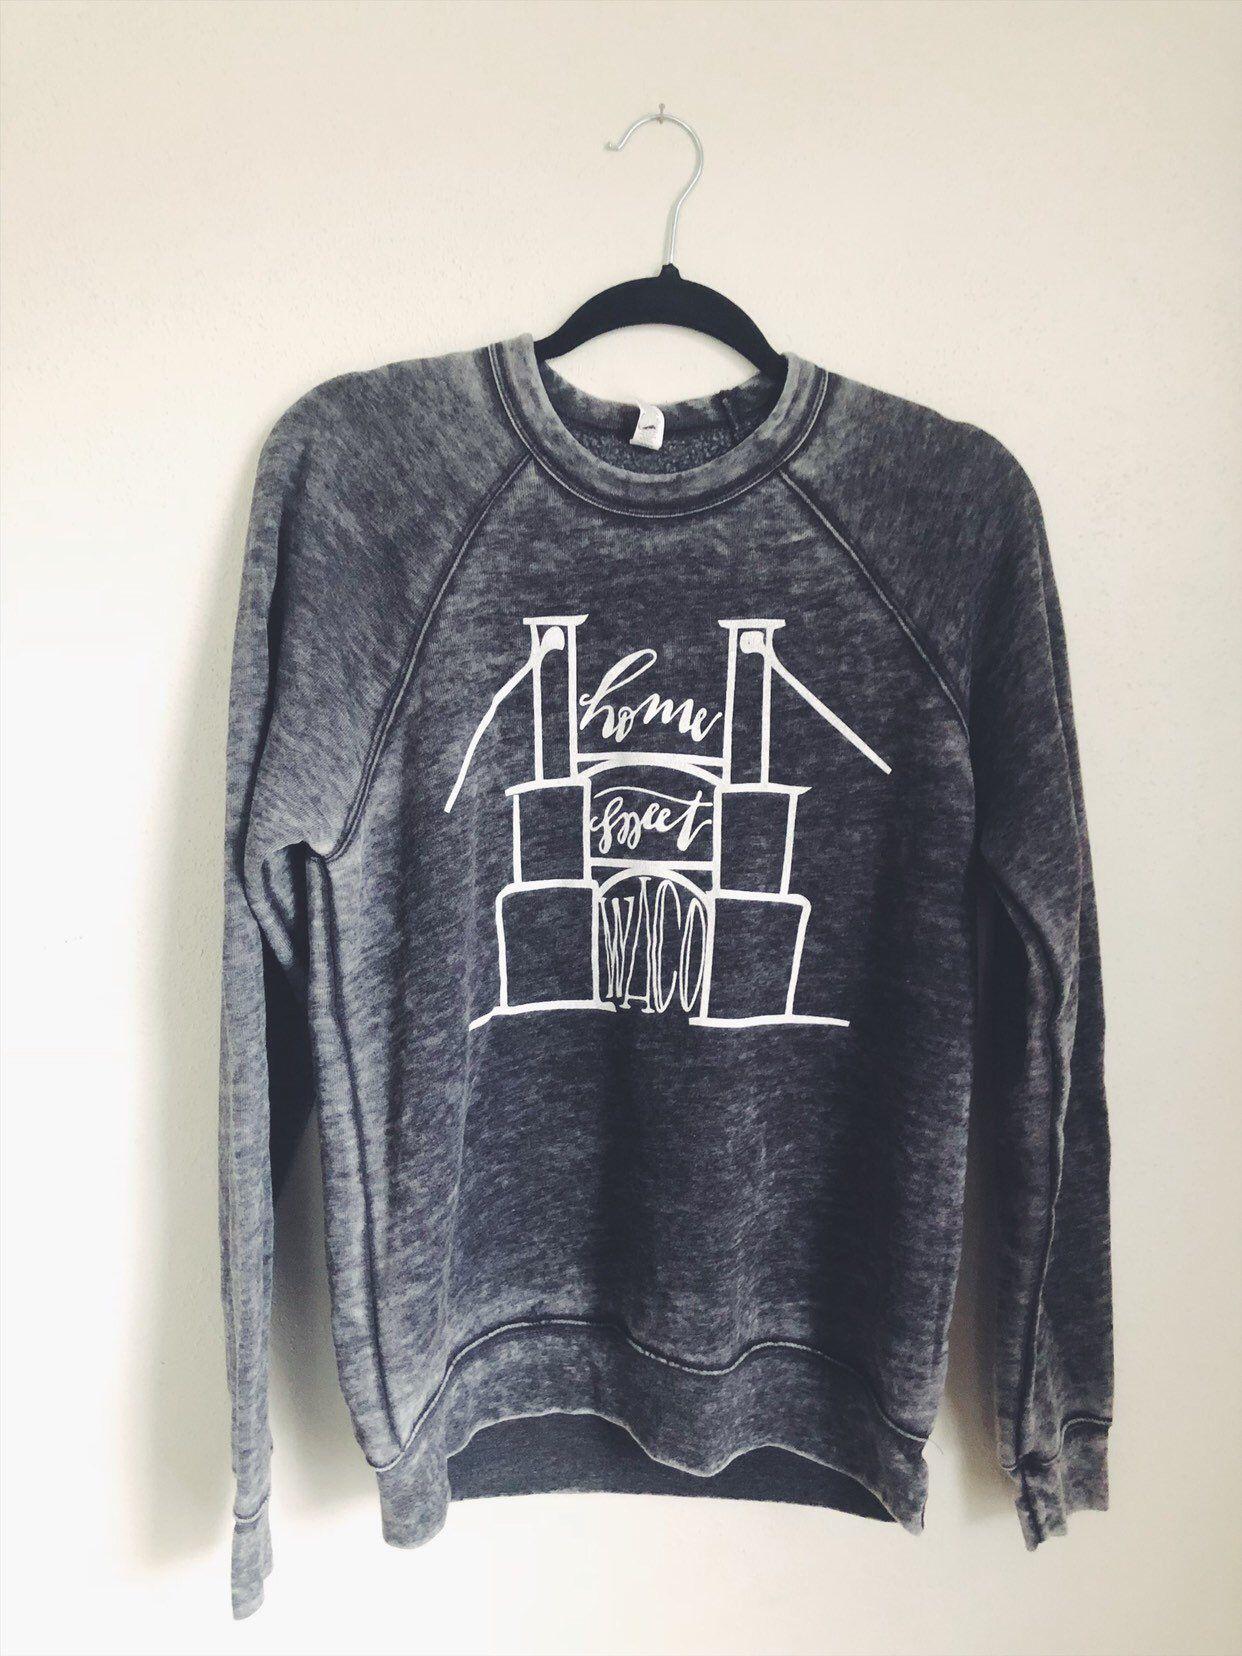 CLEARANCE*** HOME sweet WACO sweatshirt, Waco sweatshirt